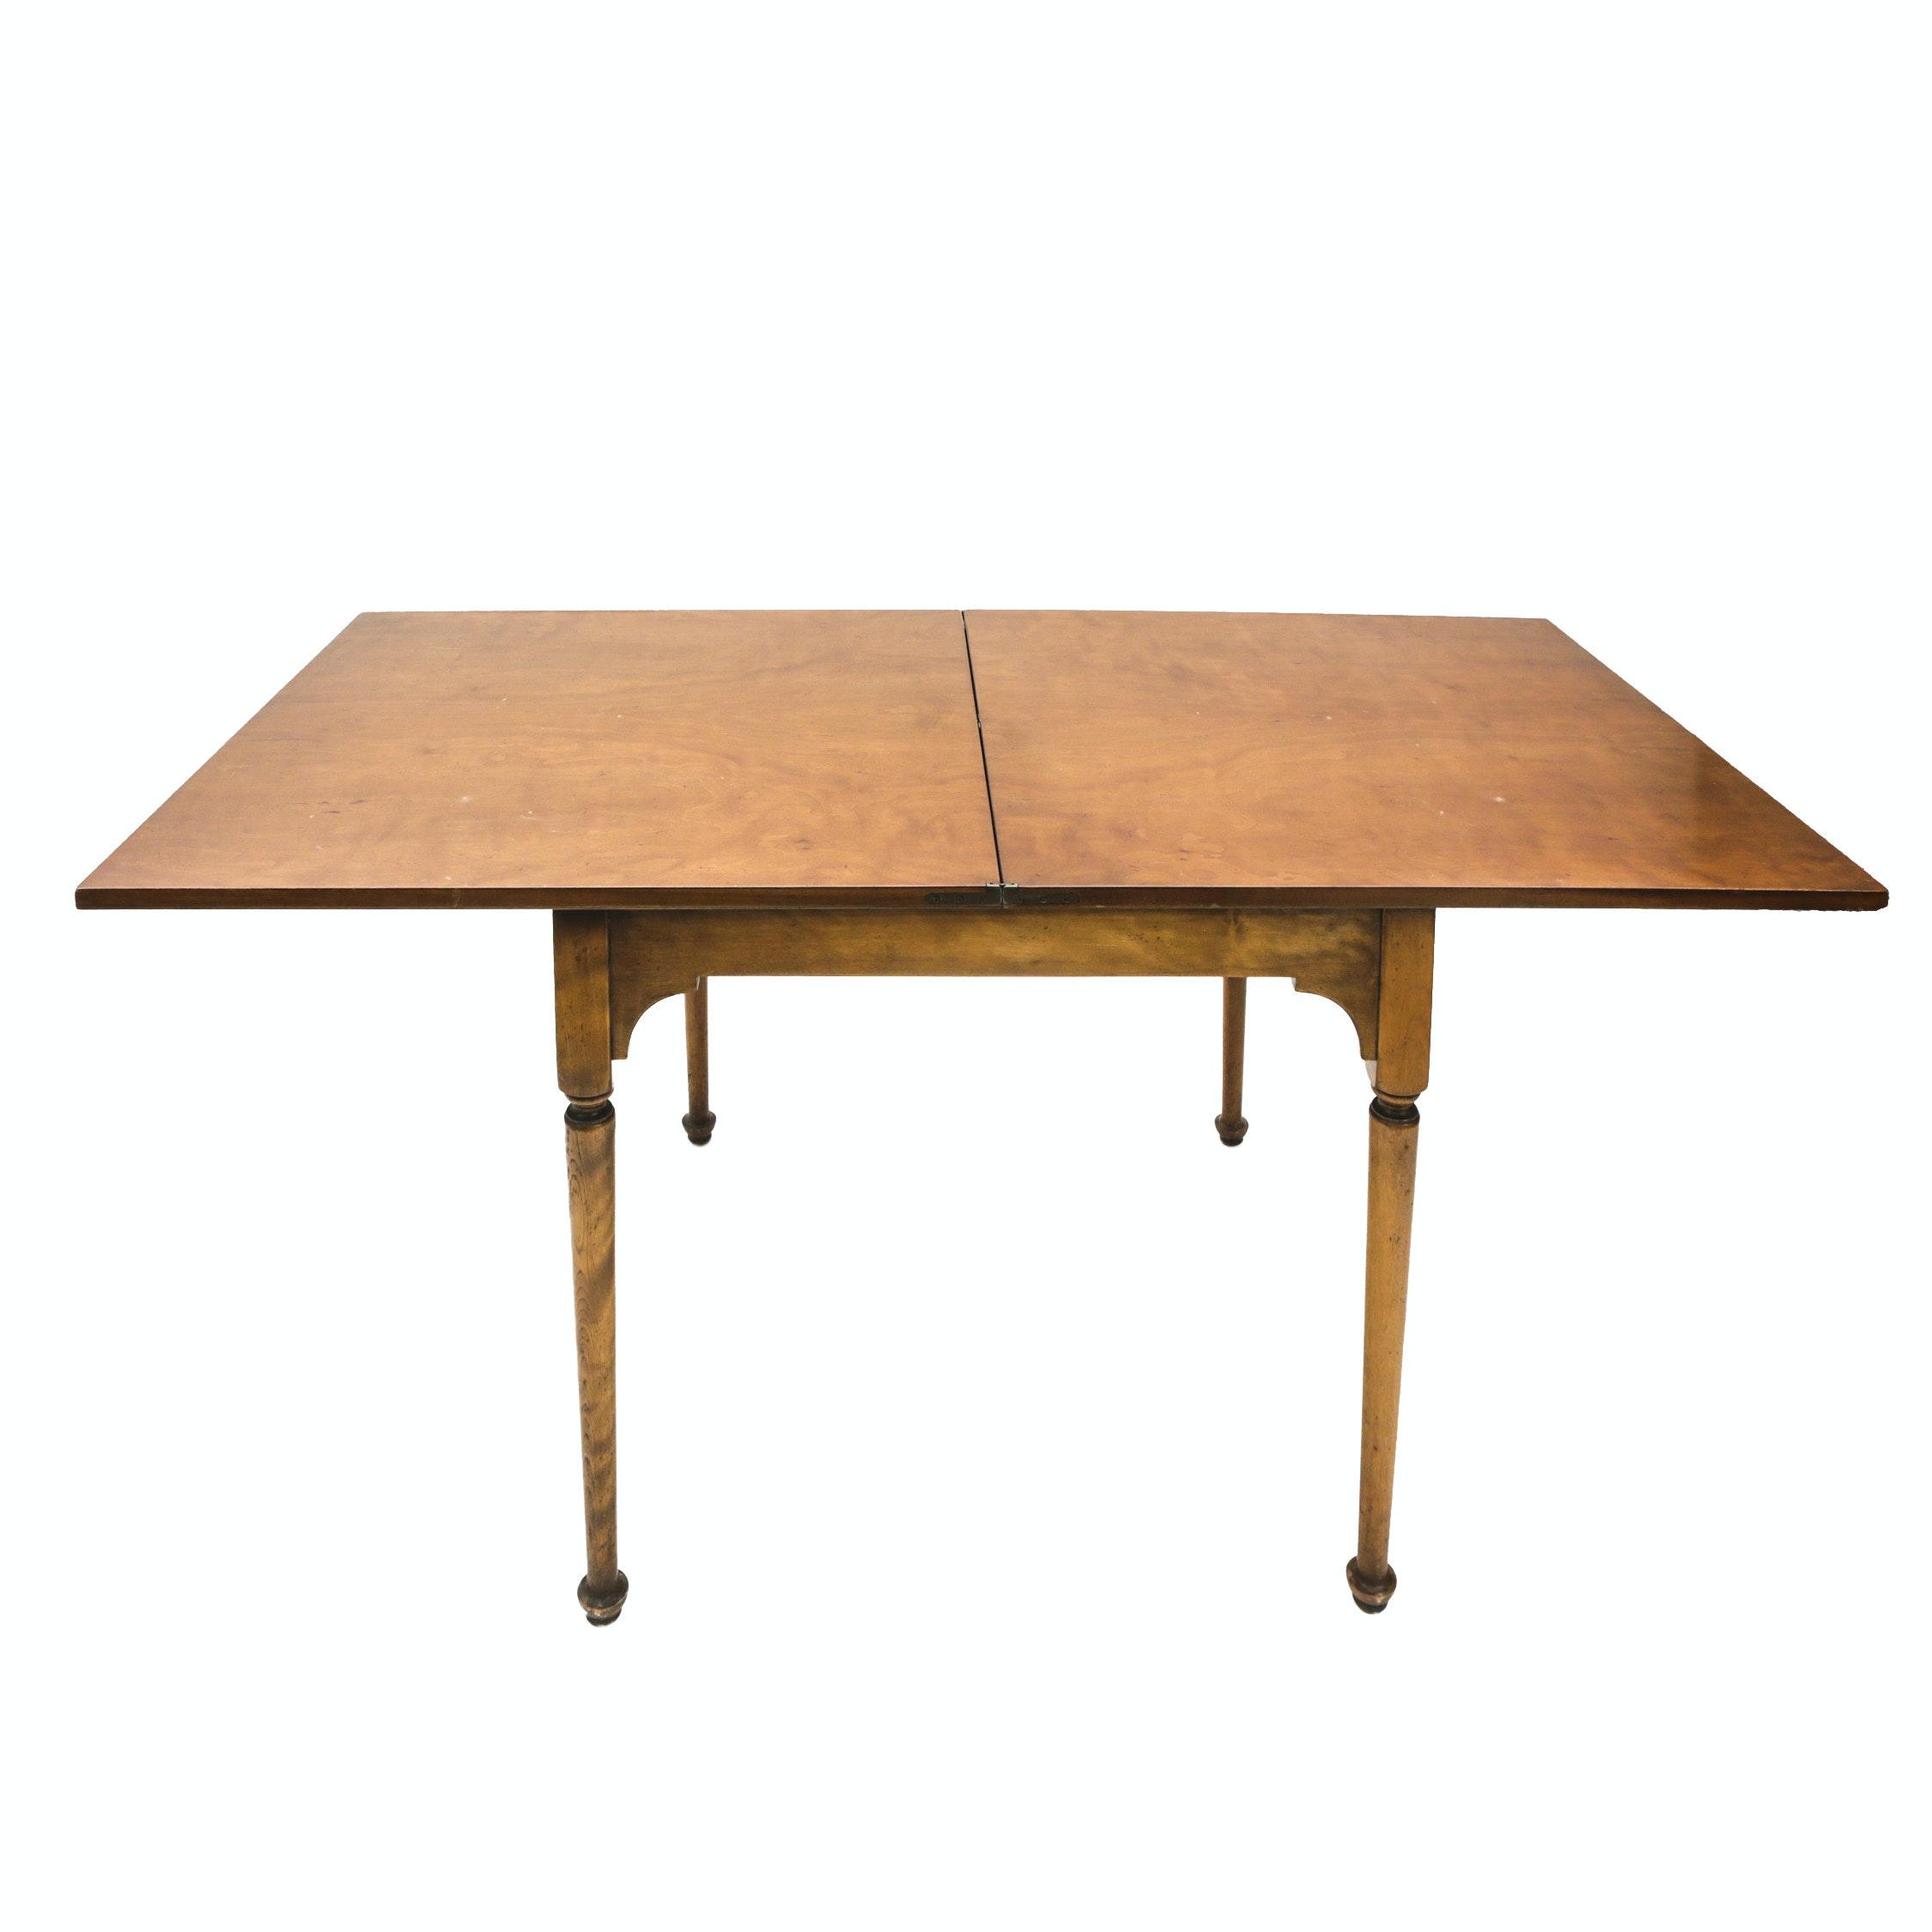 An antique Bernard and Simons Co. Poker Table